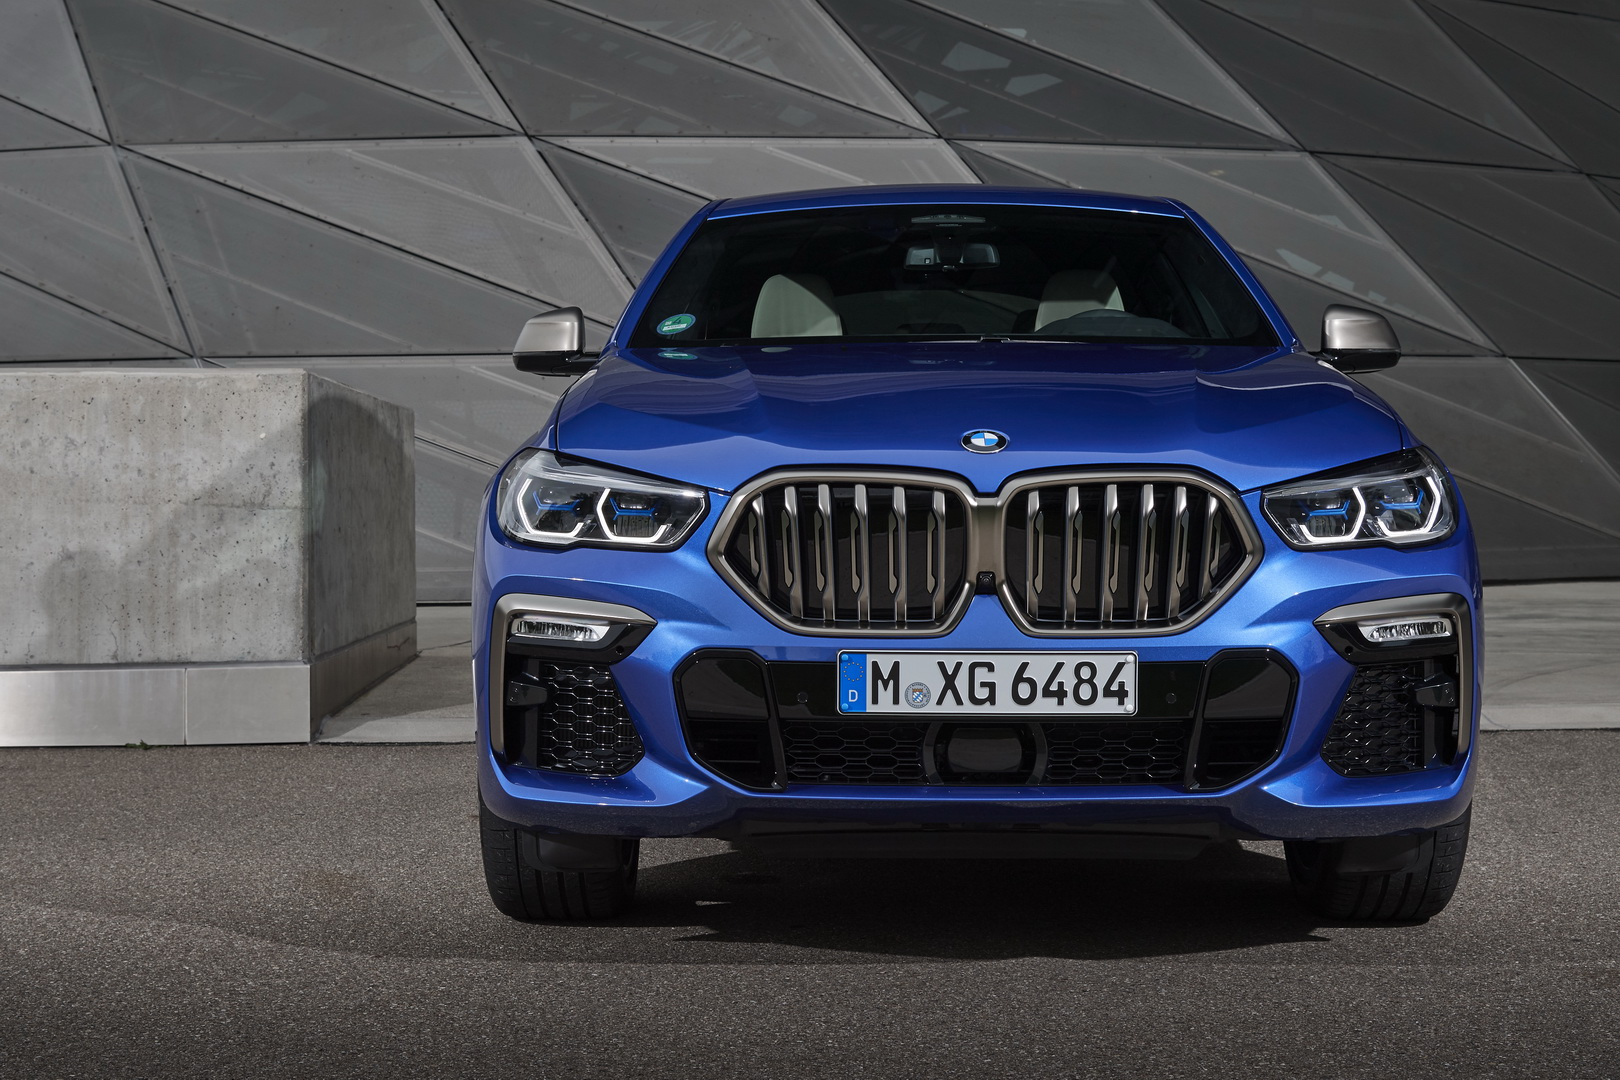 BMW X6 xDrive40d Mild-Hybrid